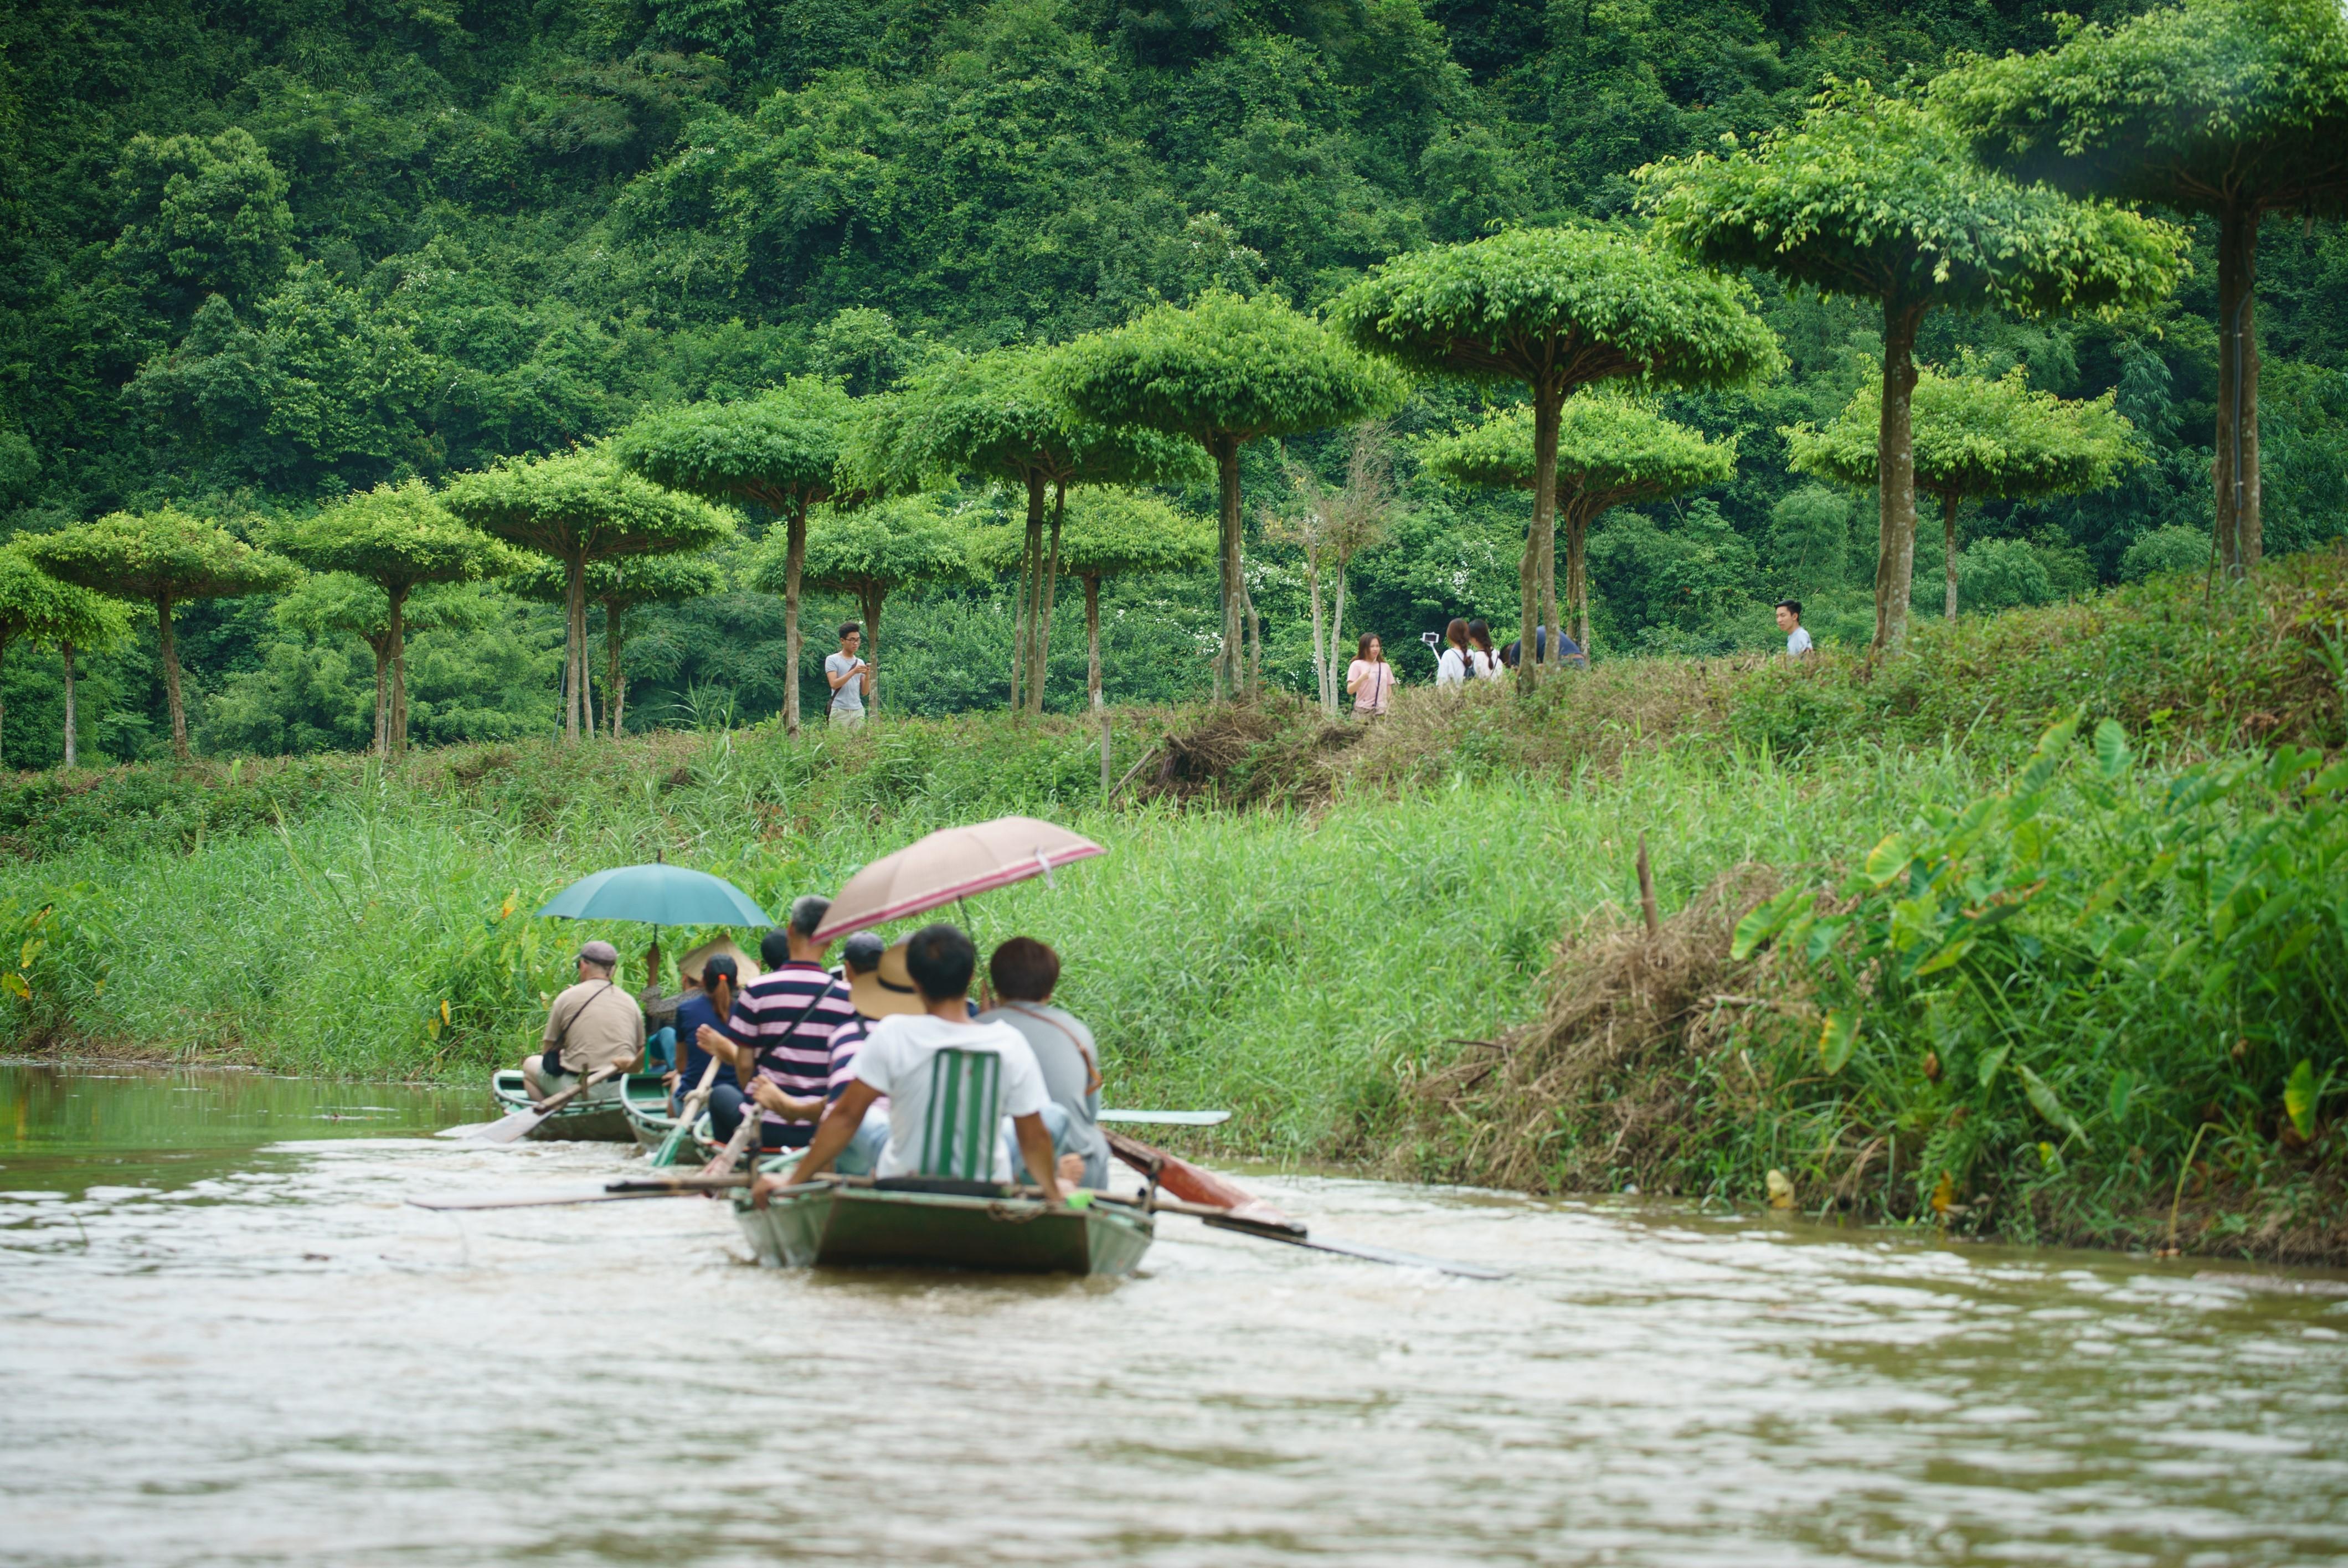 Boat tour in Tam Coc